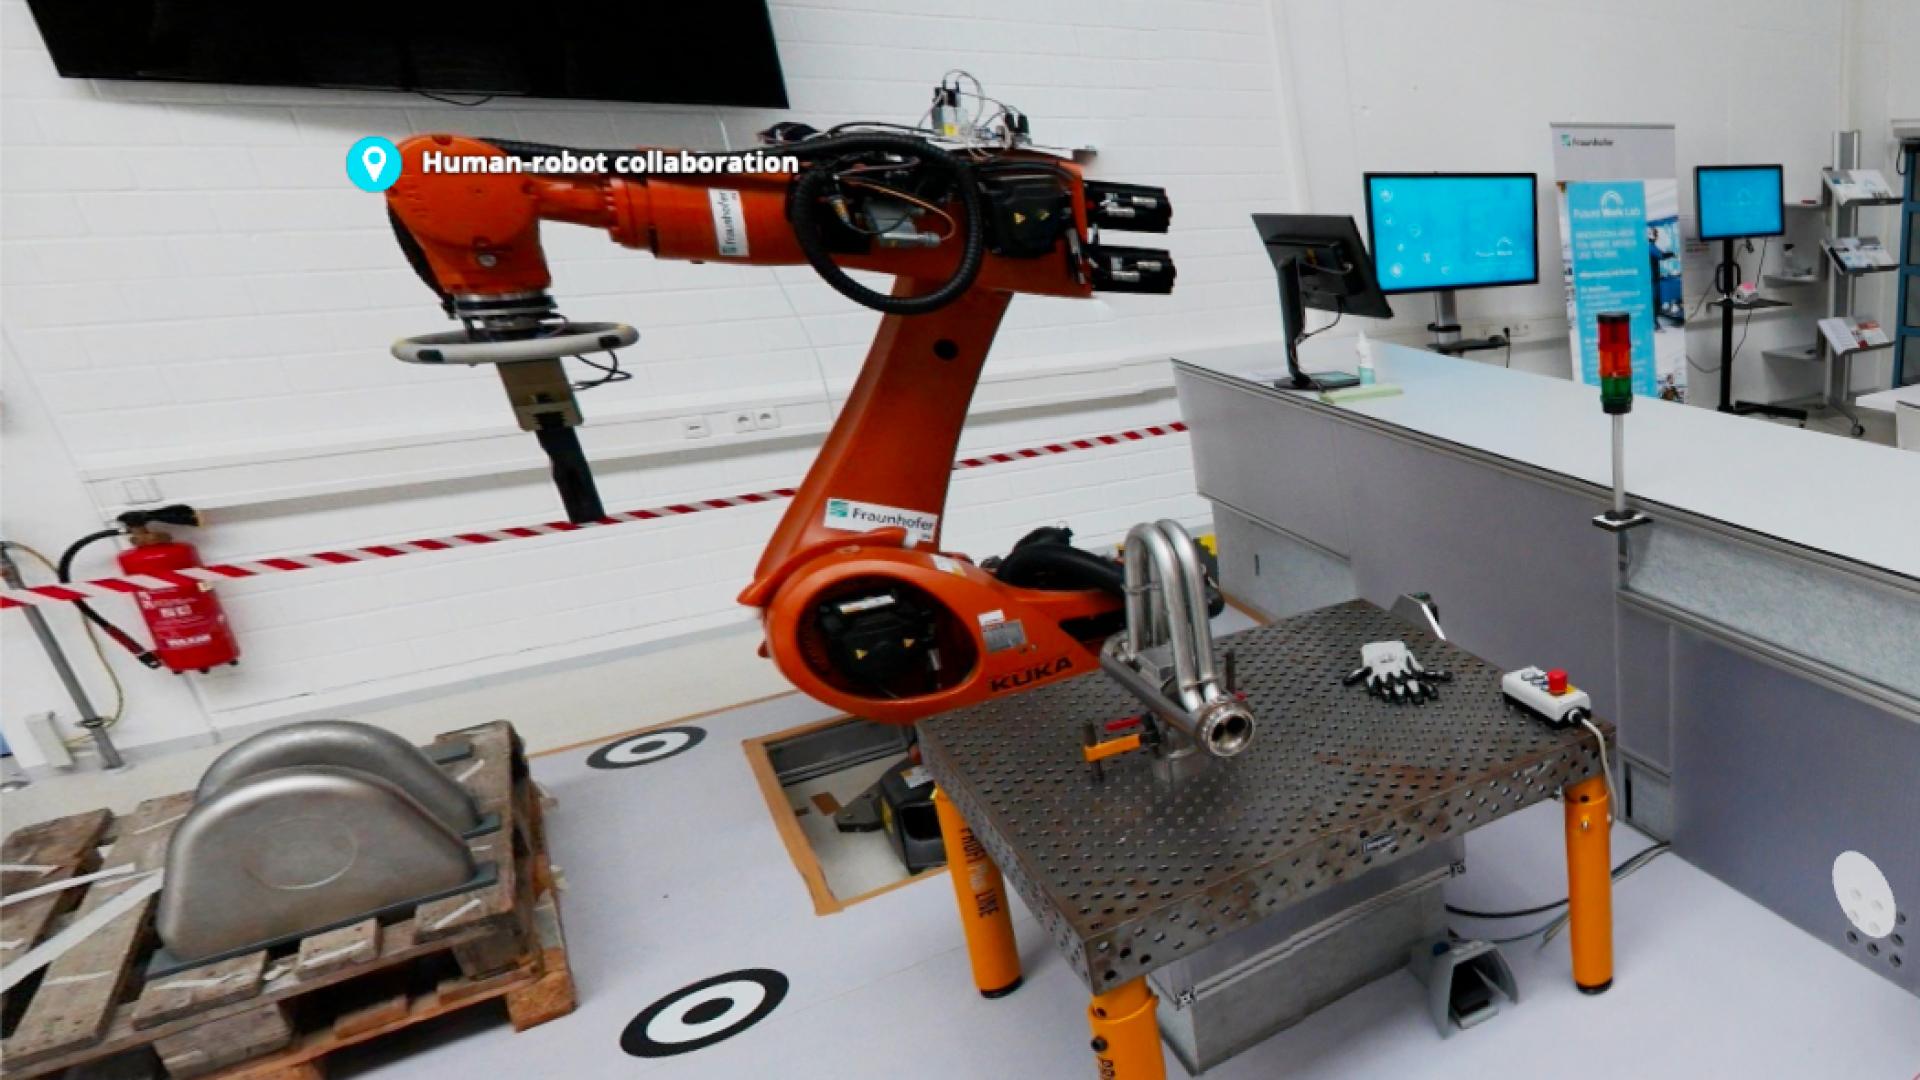 Hemminger 工程公司以及弗劳恩霍夫研究所关于未来工作的探讨